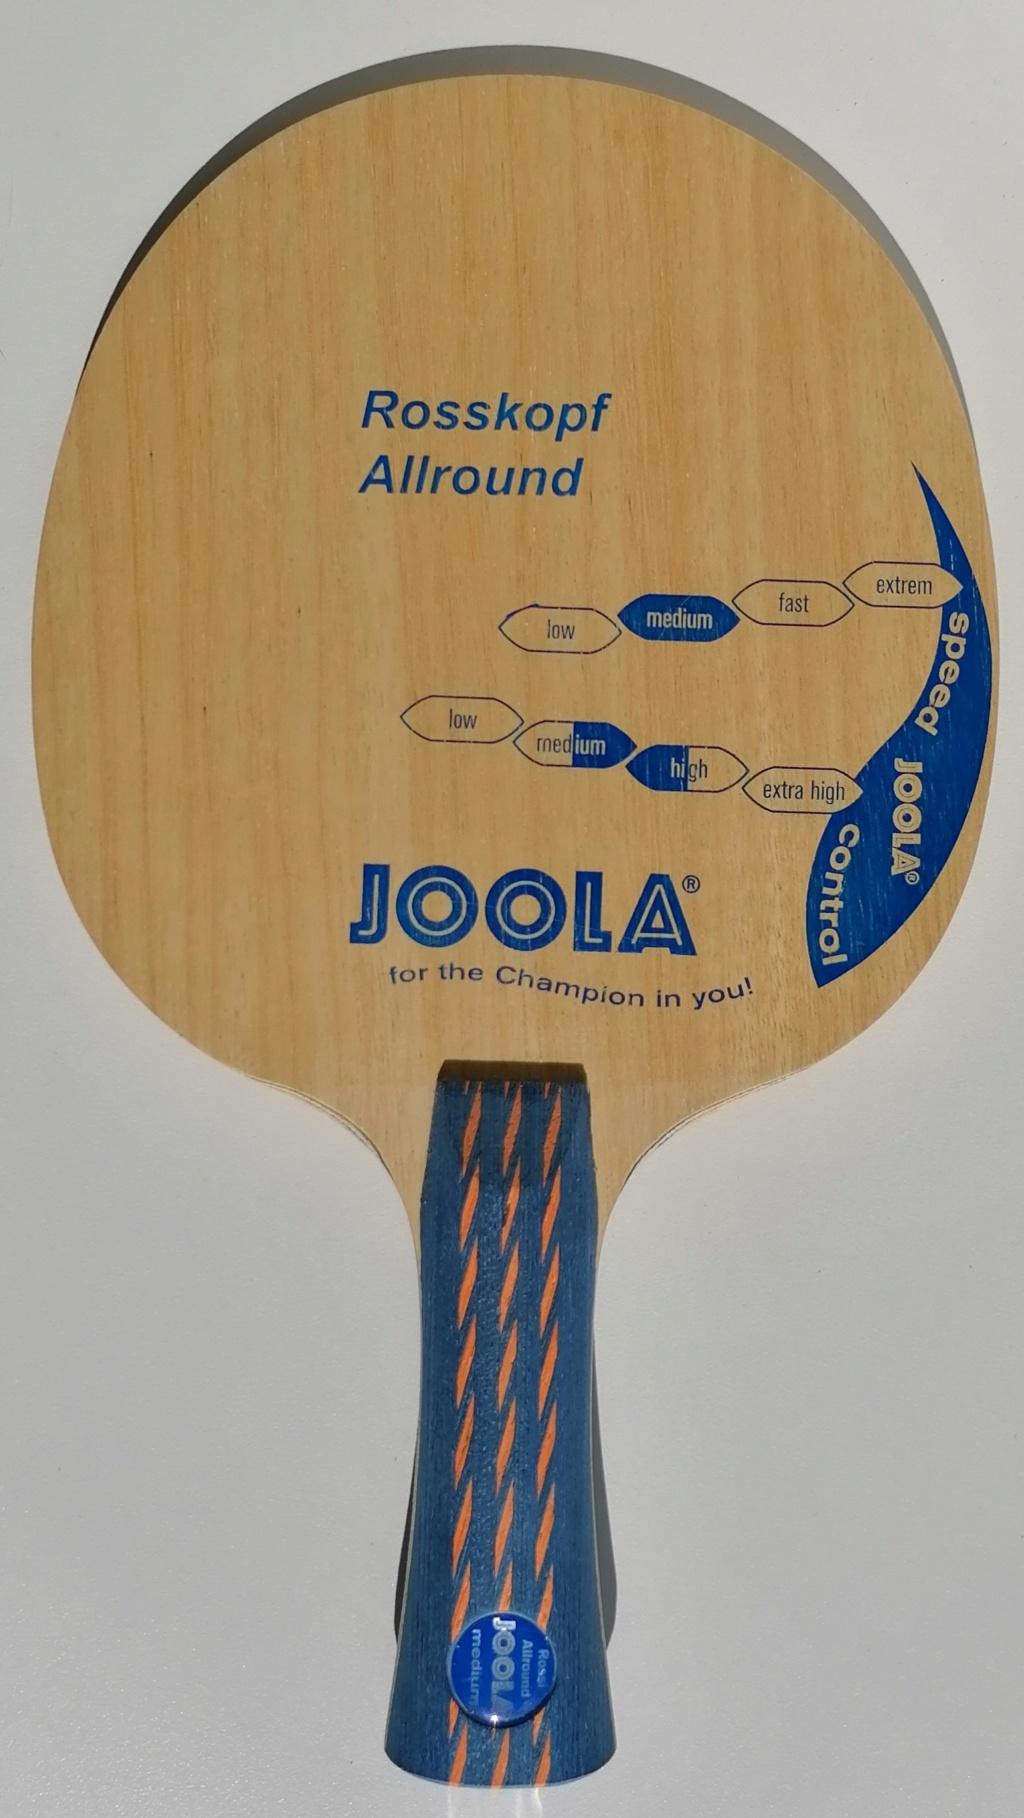 Joola Rosskopf Allround Joola_11